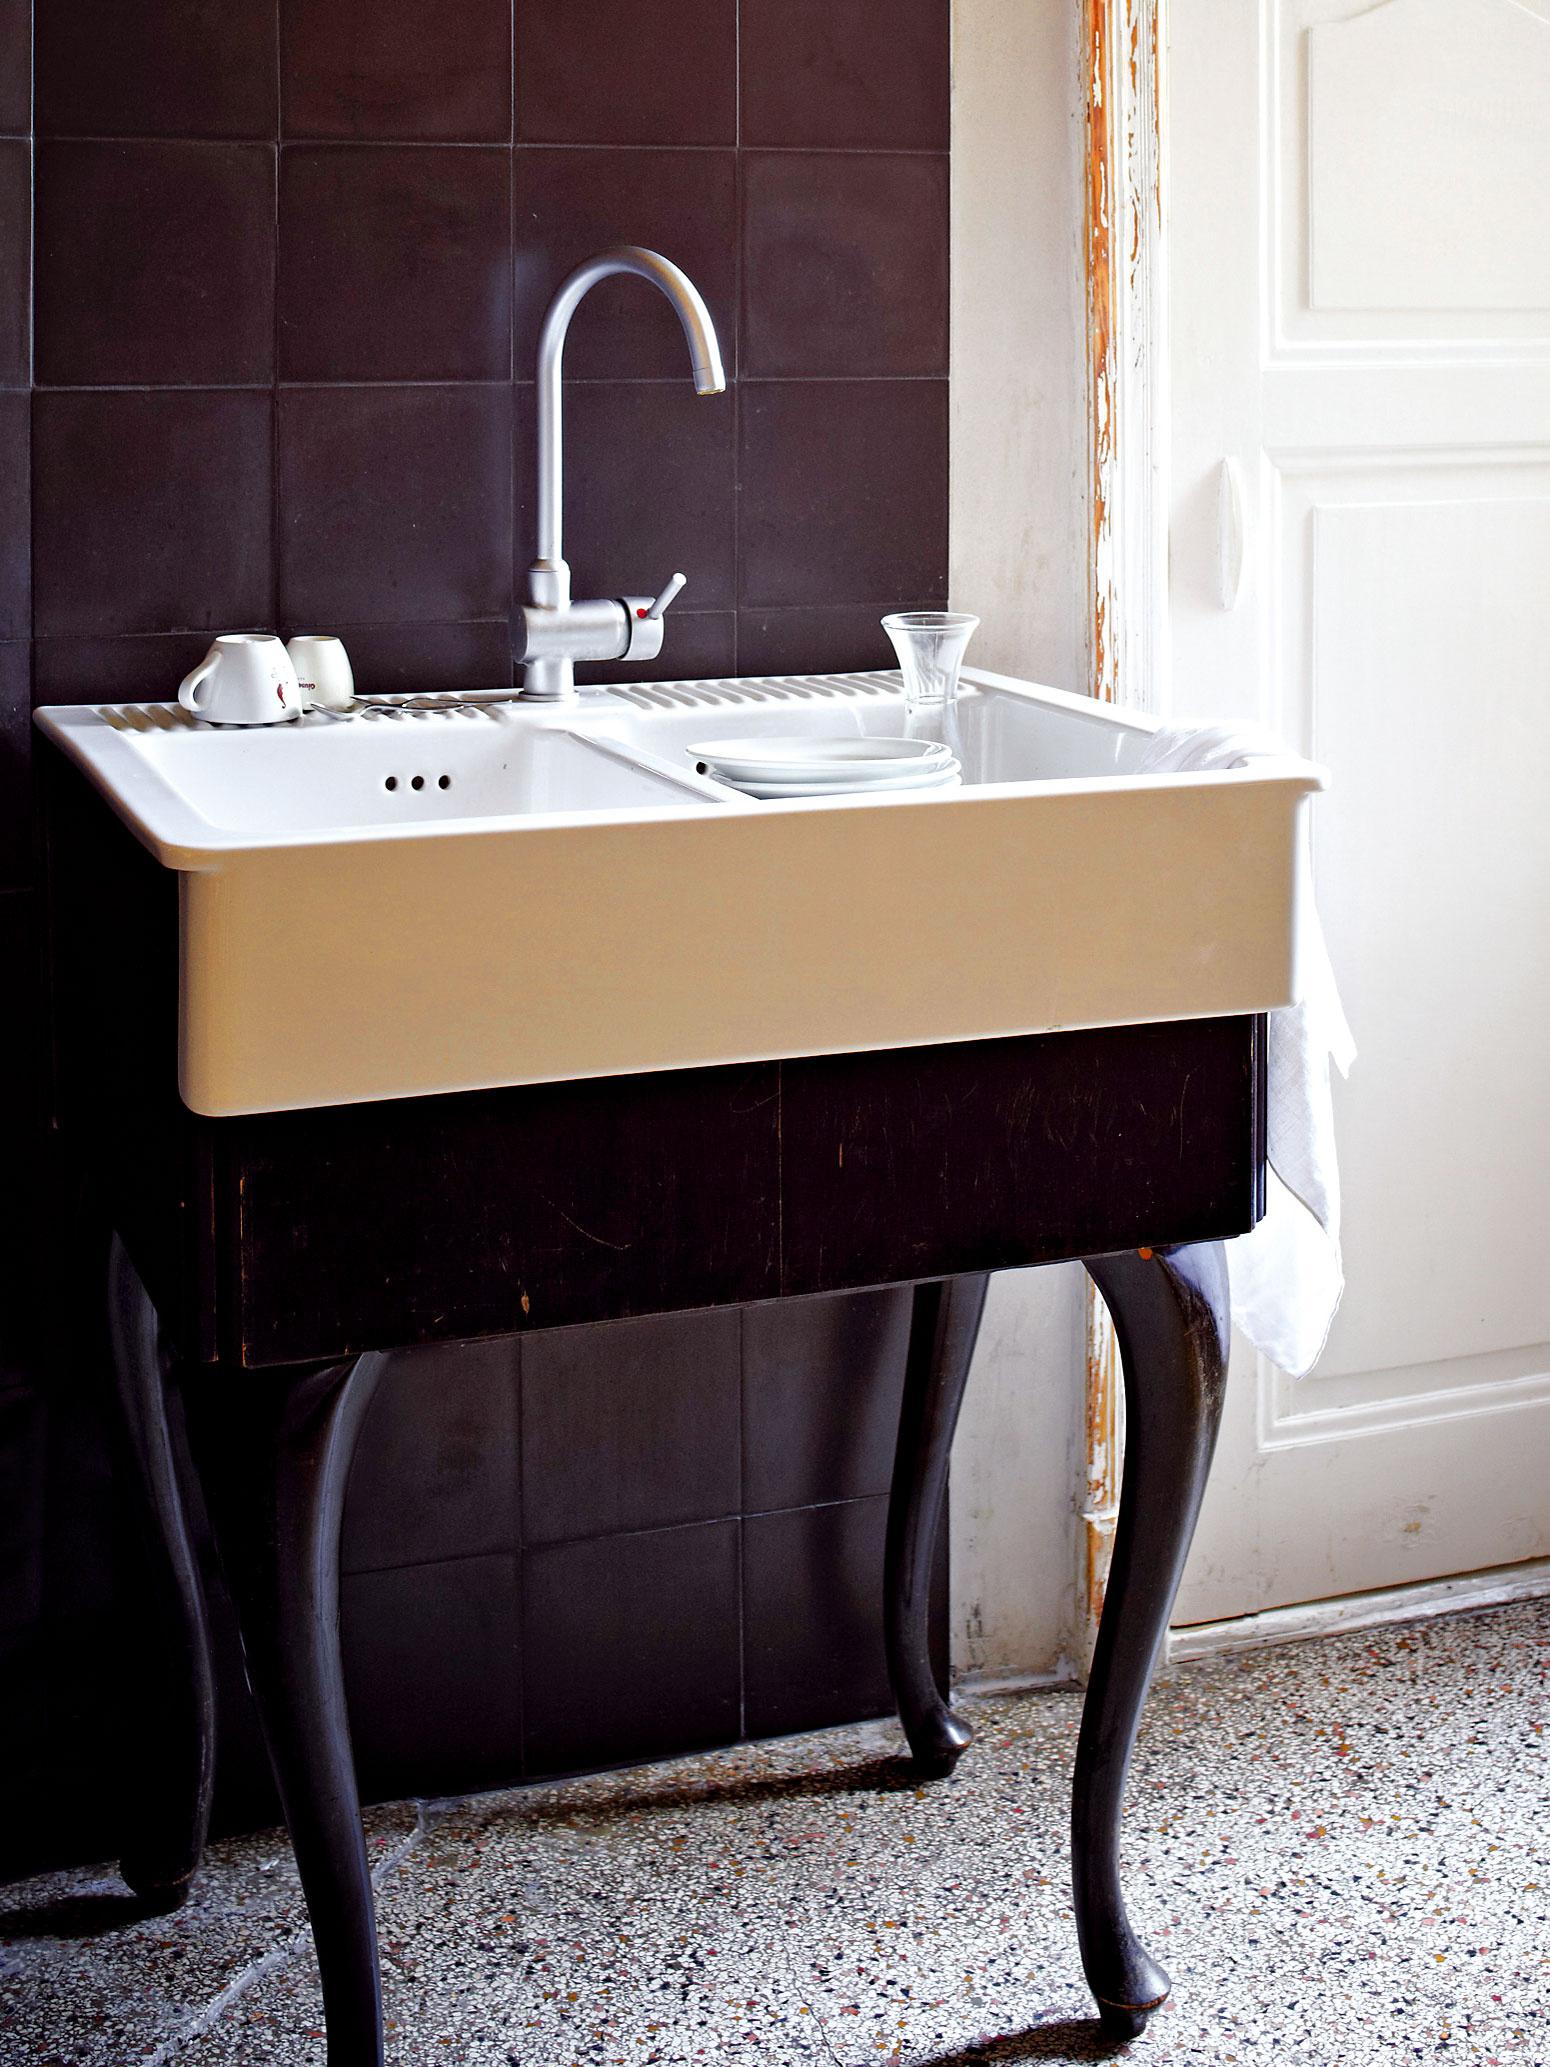 Drez inak. Andreas zrealizoval Gabrielinu predstavu oelegantnom kuchynskom dreze využitím starého stolíka anového keramického umývadla zIkey.